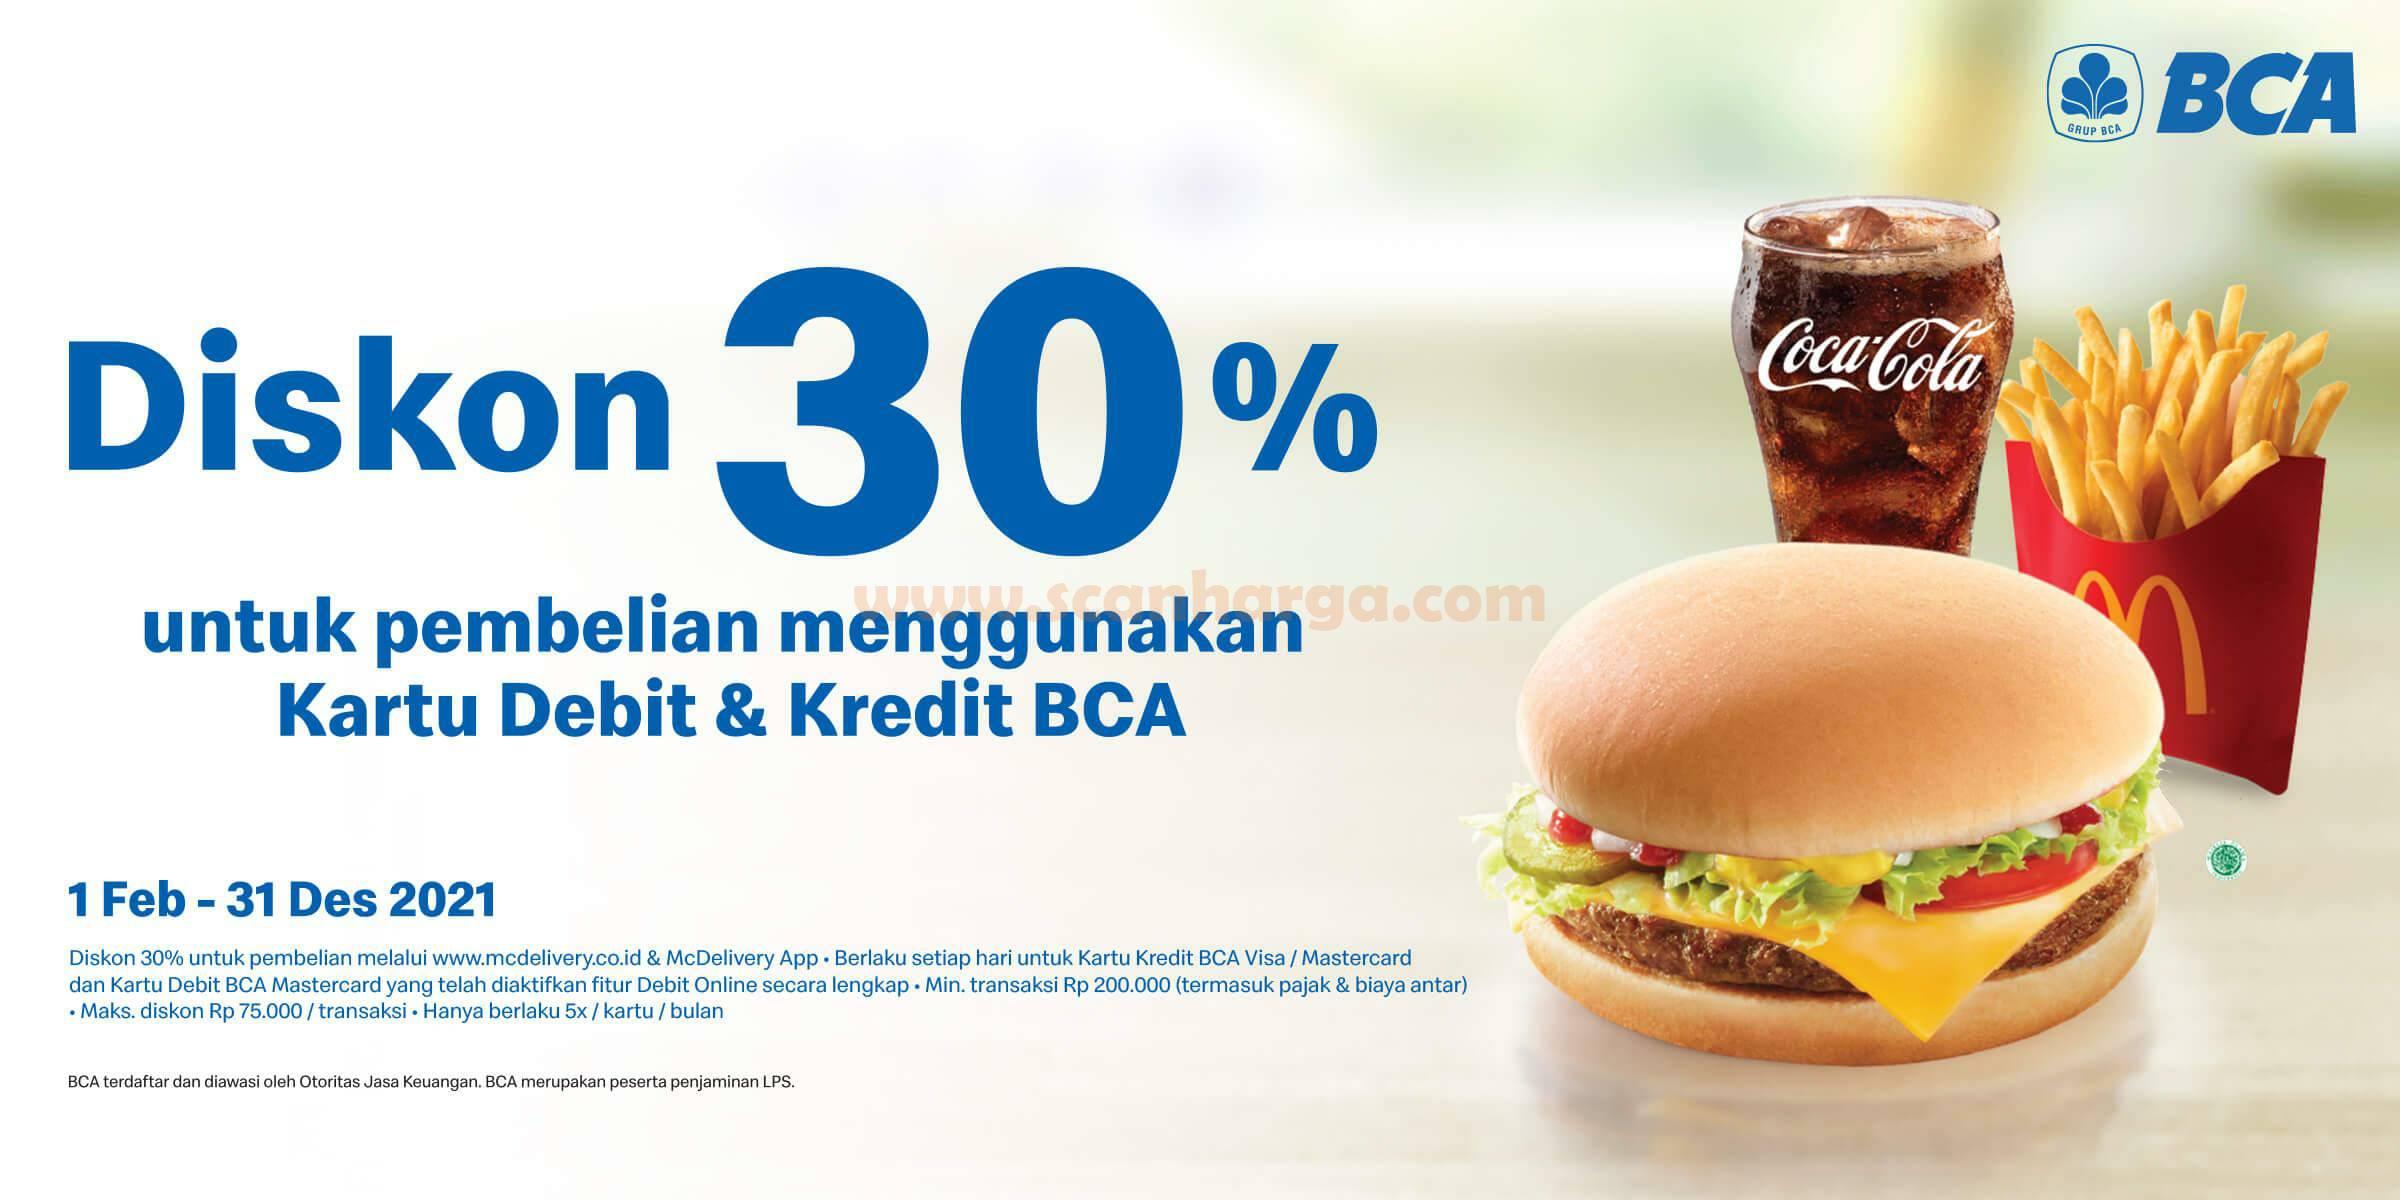 McDonalds Promo Diskon 30% dengan Kartu Debit BCA berlogo Visa/Mastercard